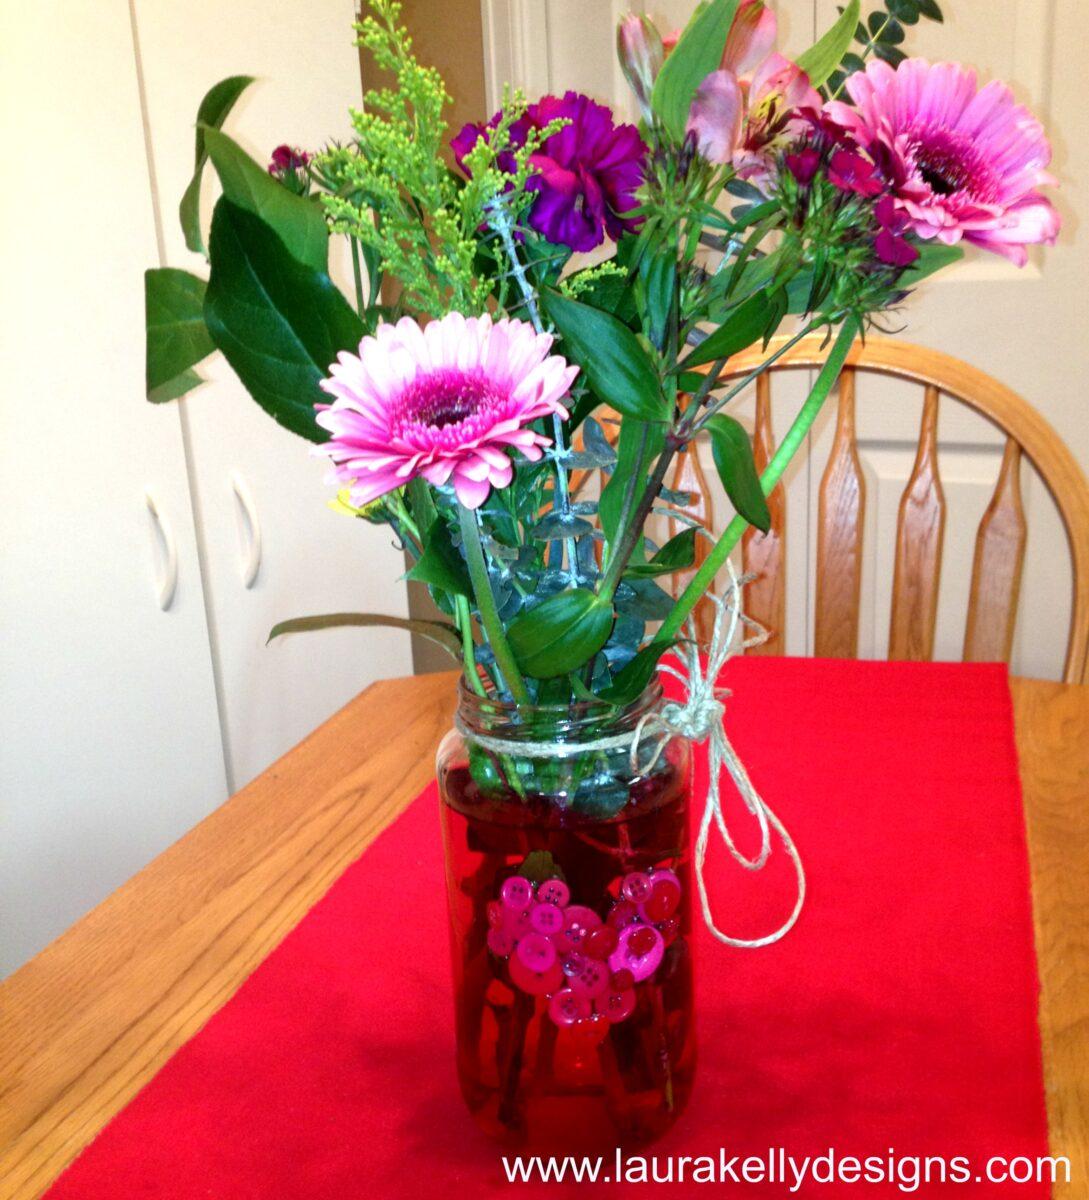 Recycled Olive Jar Turned Valentines Day Flower Vase